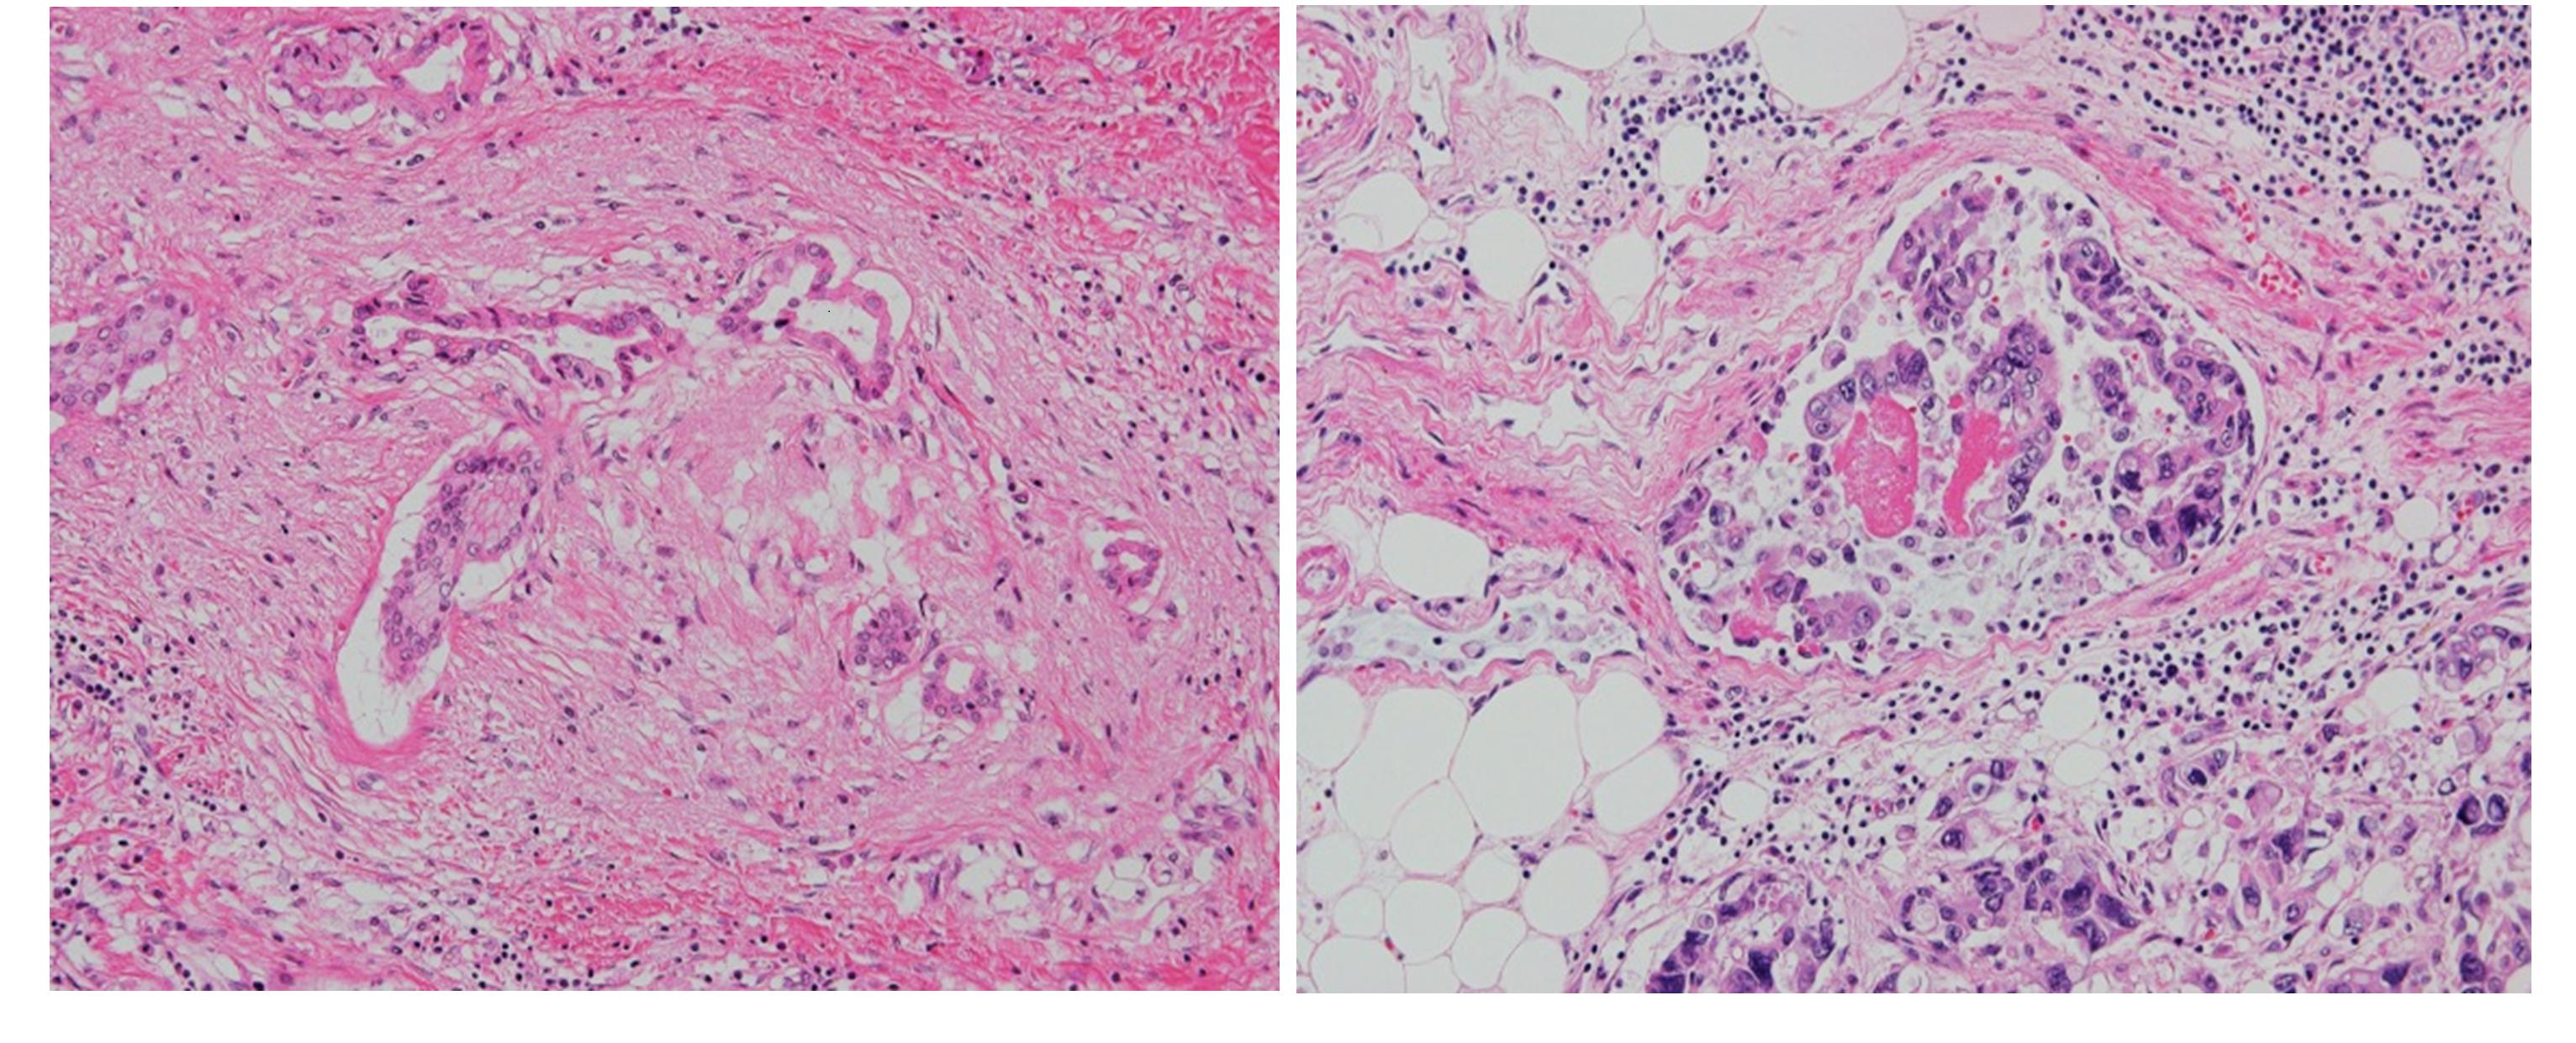 図1、不顕性癌の病理像、Hematoxylin & Eosin染色